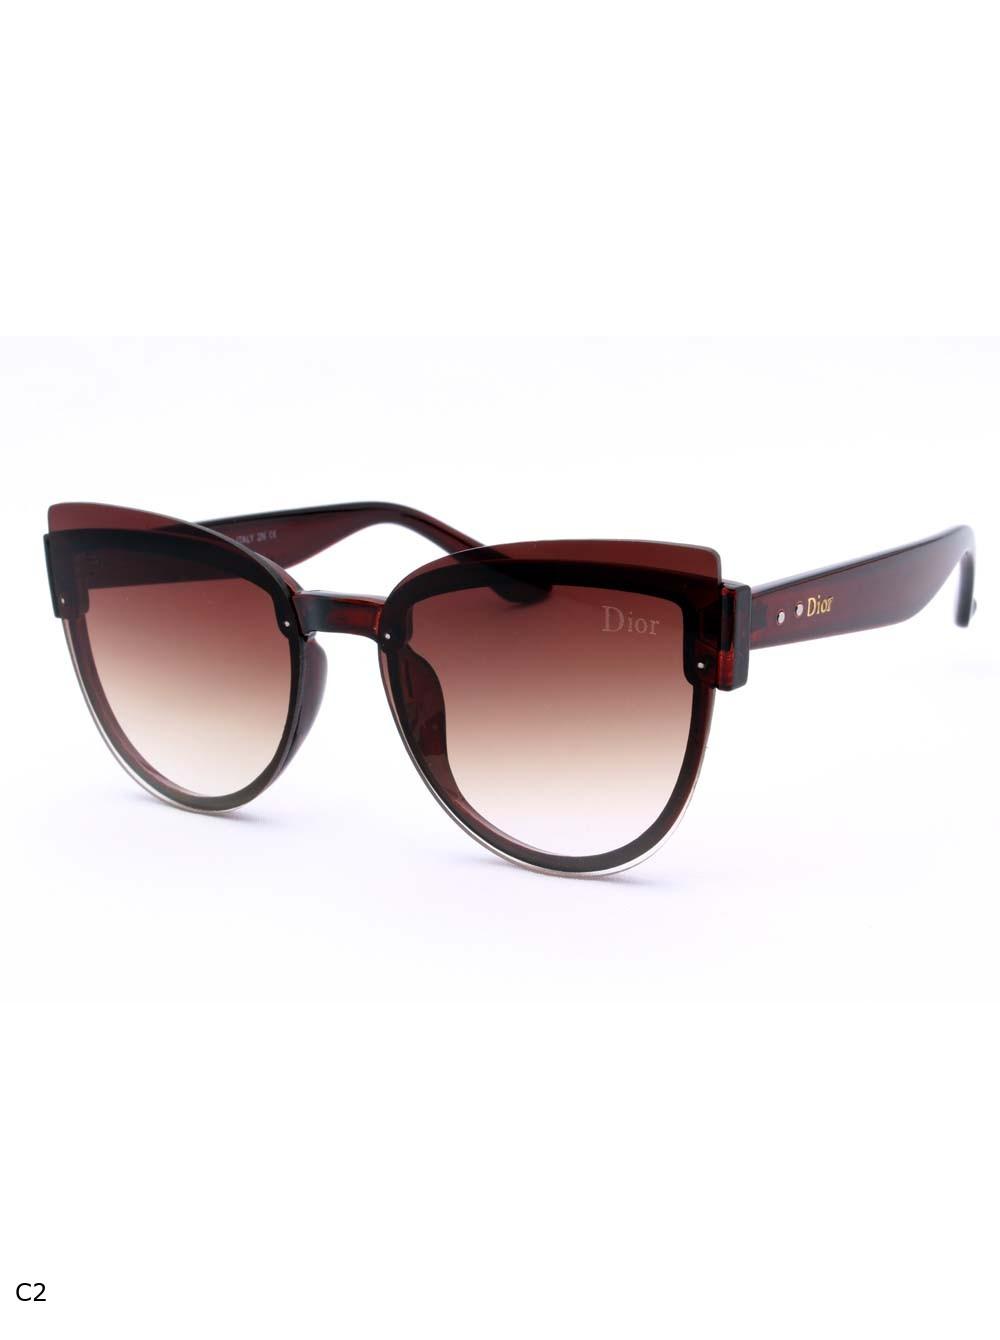 Очки-Dior - CD8831